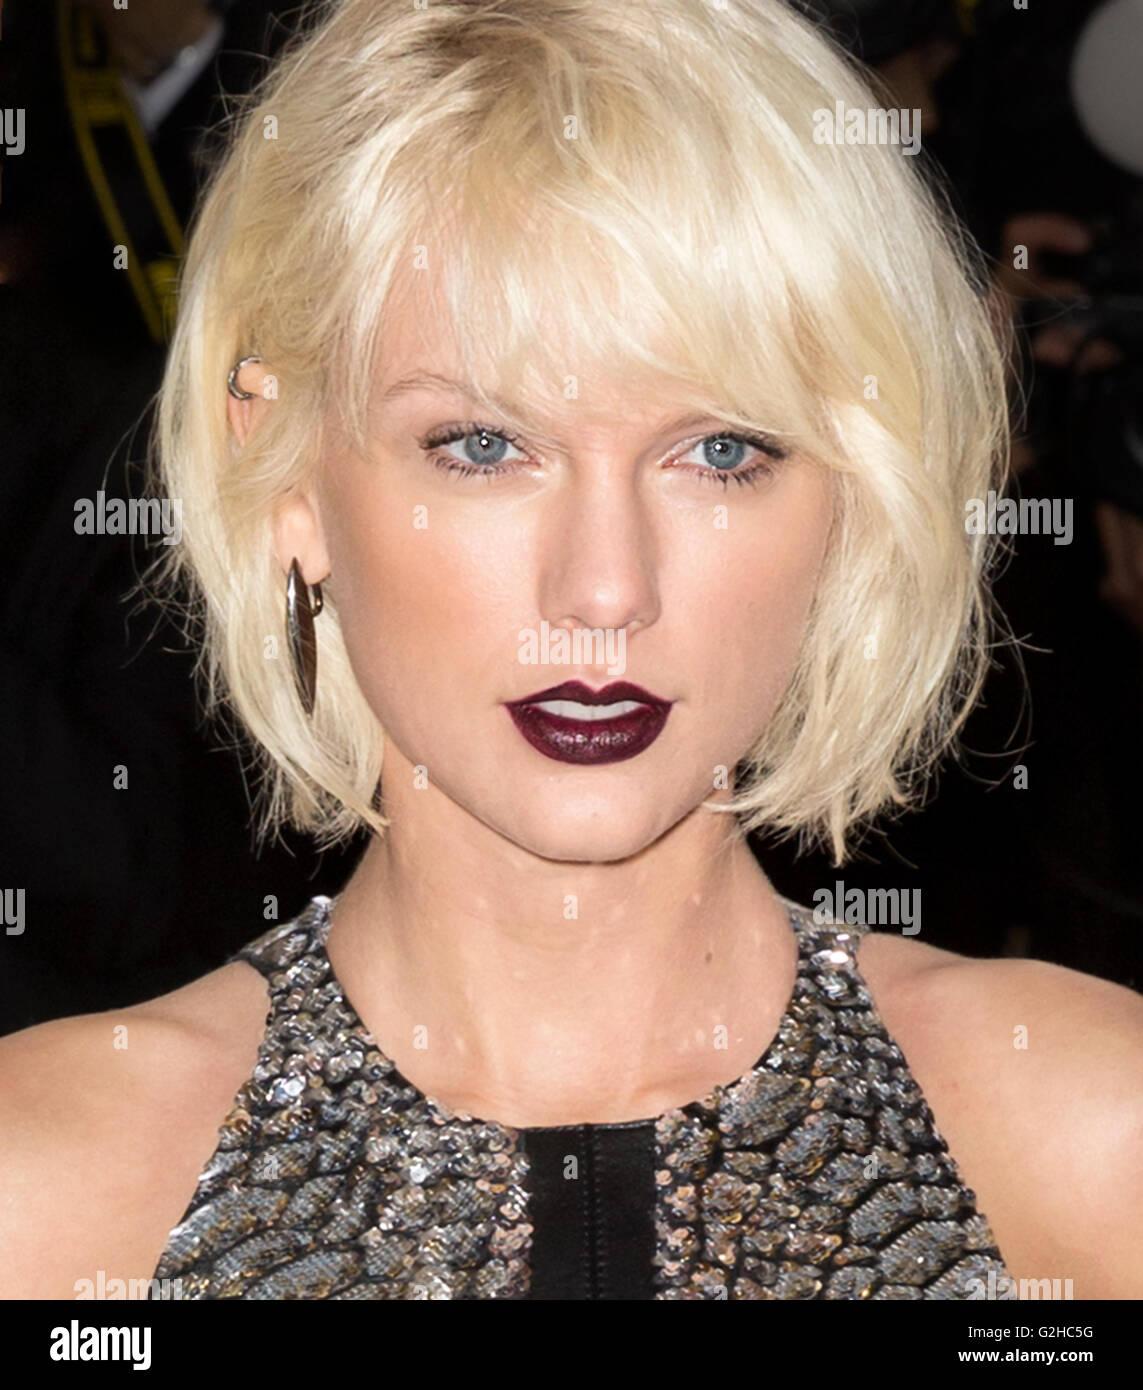 Christmas Lights Glisten Taylor Swift: Taylor Swift White Stock Photos & Taylor Swift White Stock